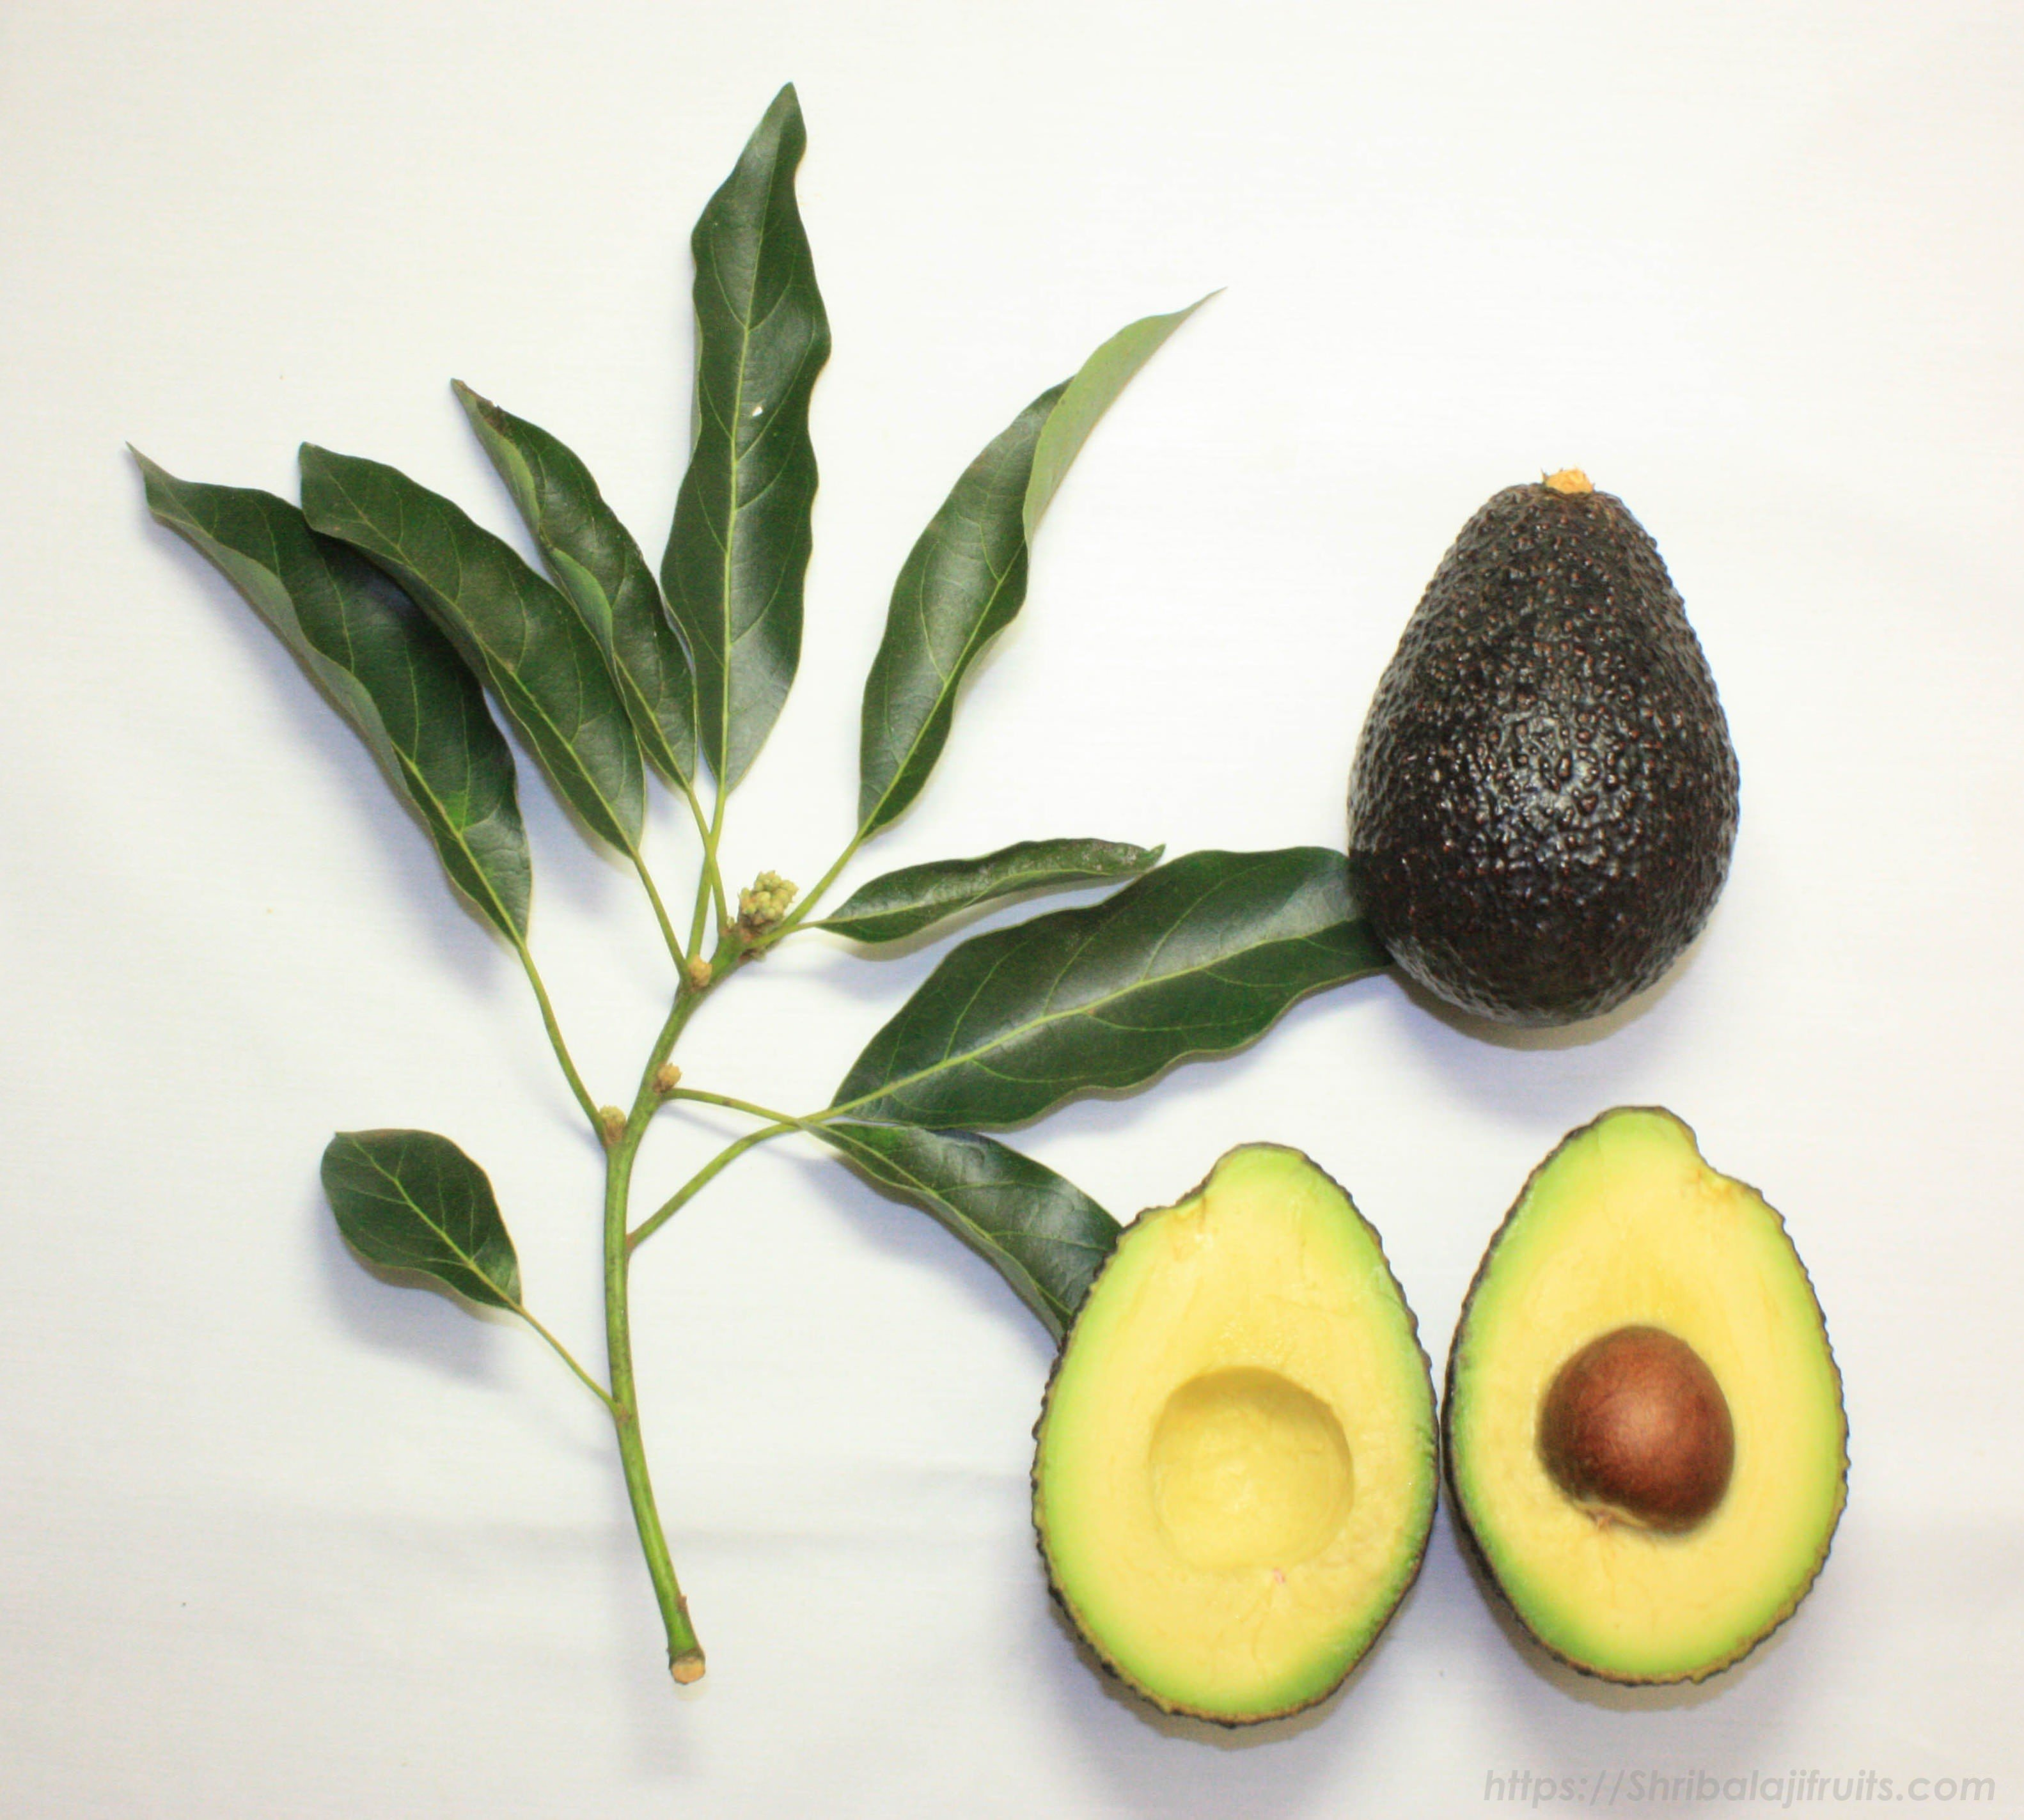 avocado fruit or vegetable